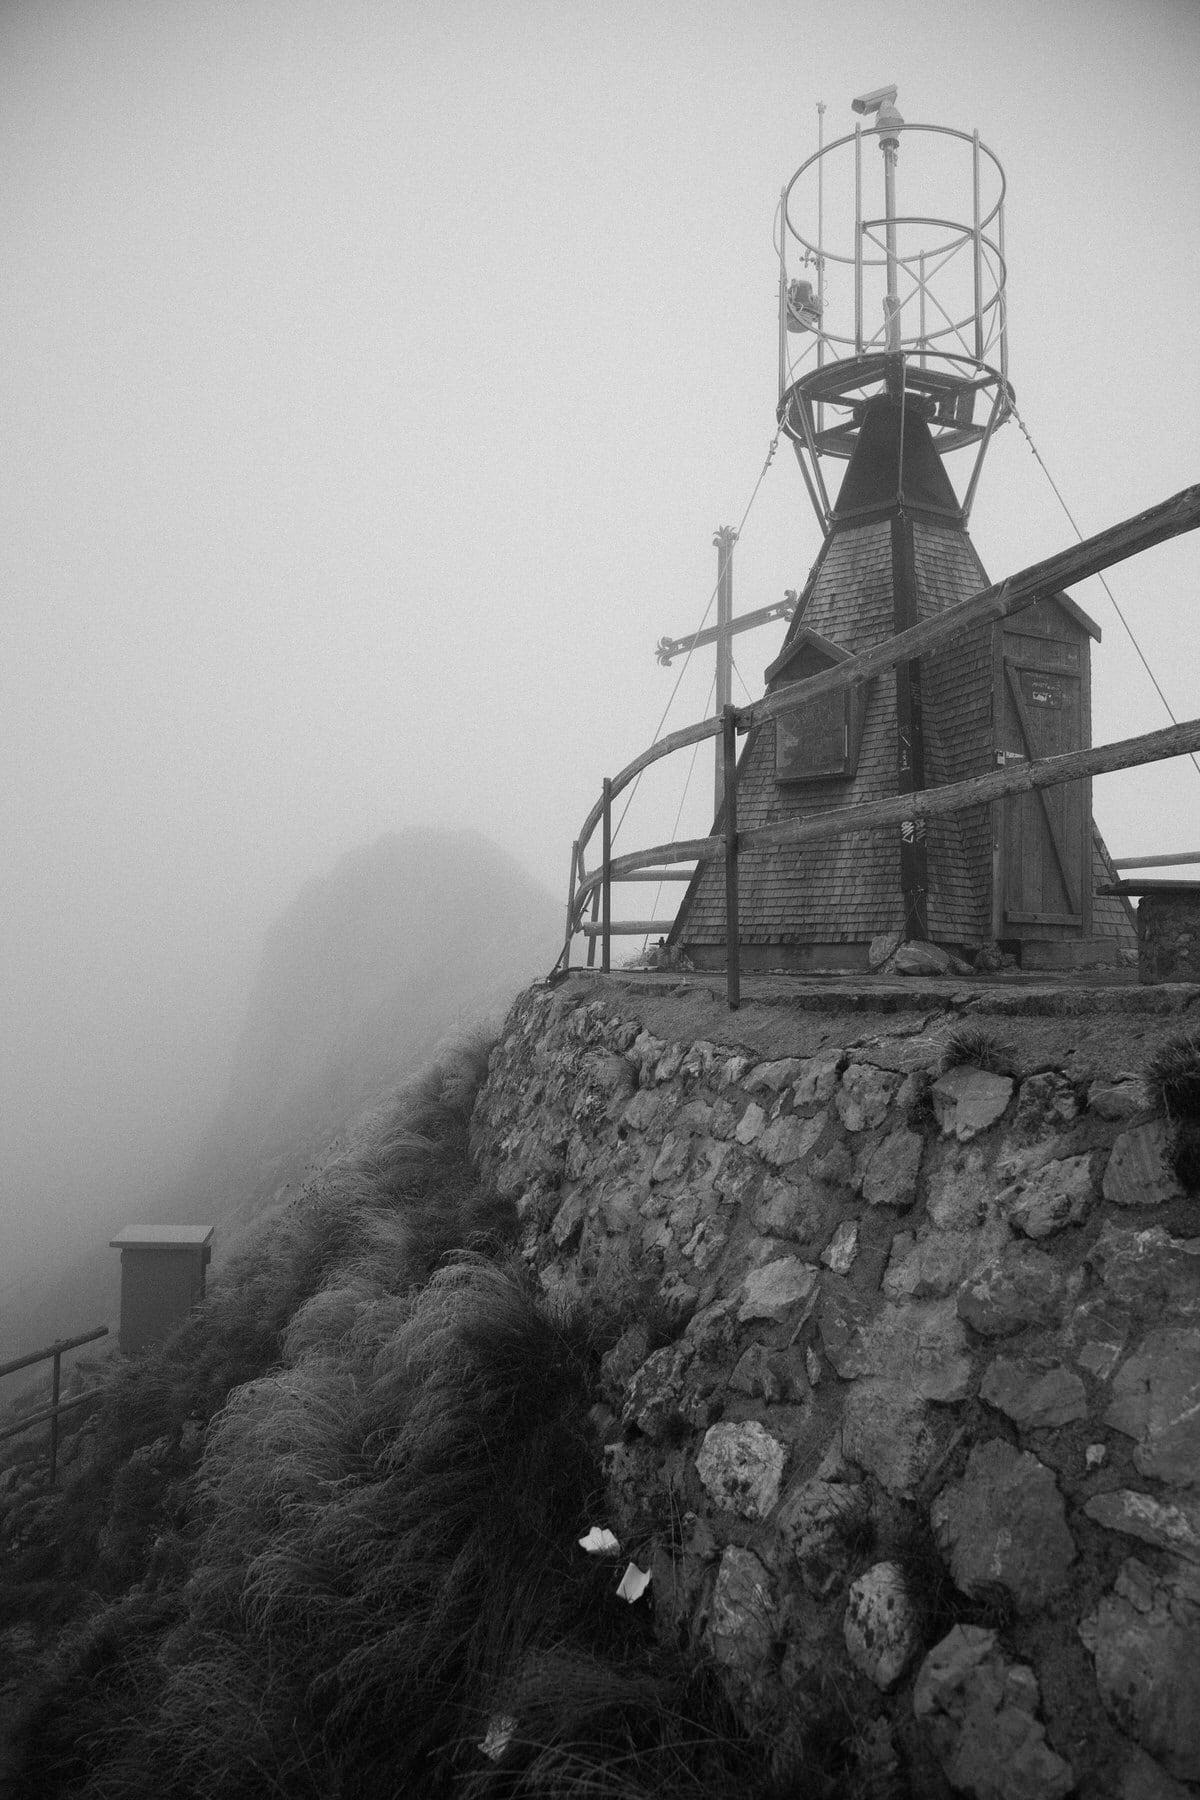 Mount_Pilatus_Lucerne_Switzerland-black-and-white-fine-art-photography-by-Studio-L-photographer-Laura-Schneider-_4399